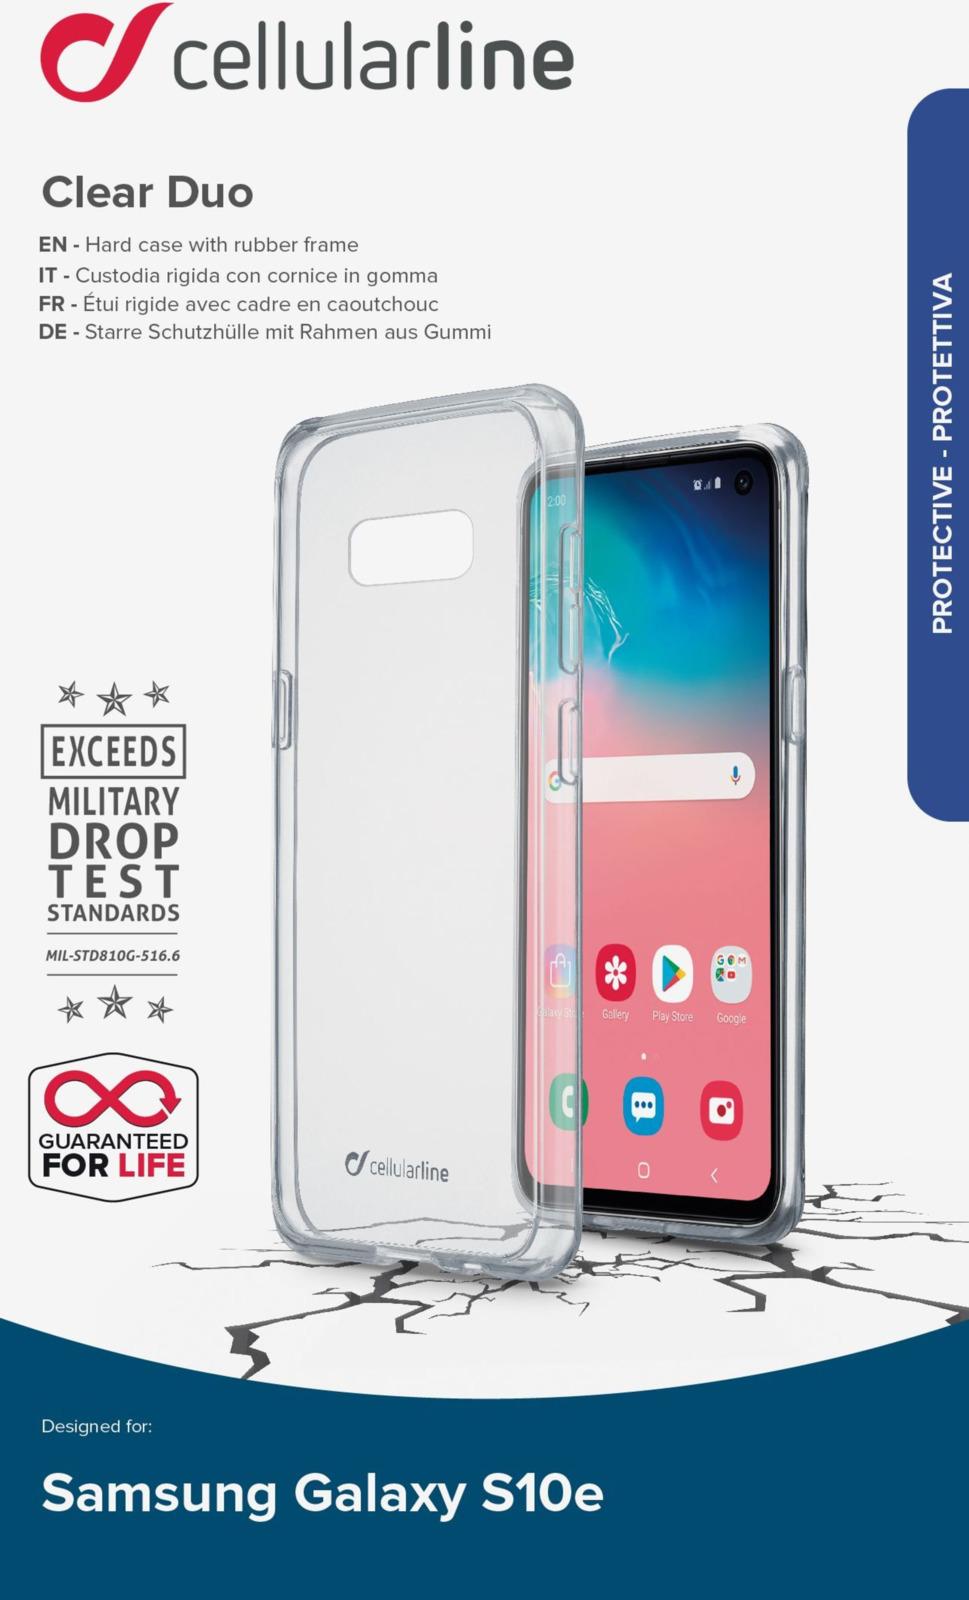 Чехол Cellularline для Samsung Galaxy S10 Lite, CLEARDUOGALS10LT, прозрачный чехол для samsung galaxy s8 cellularline clear duo прозрачный